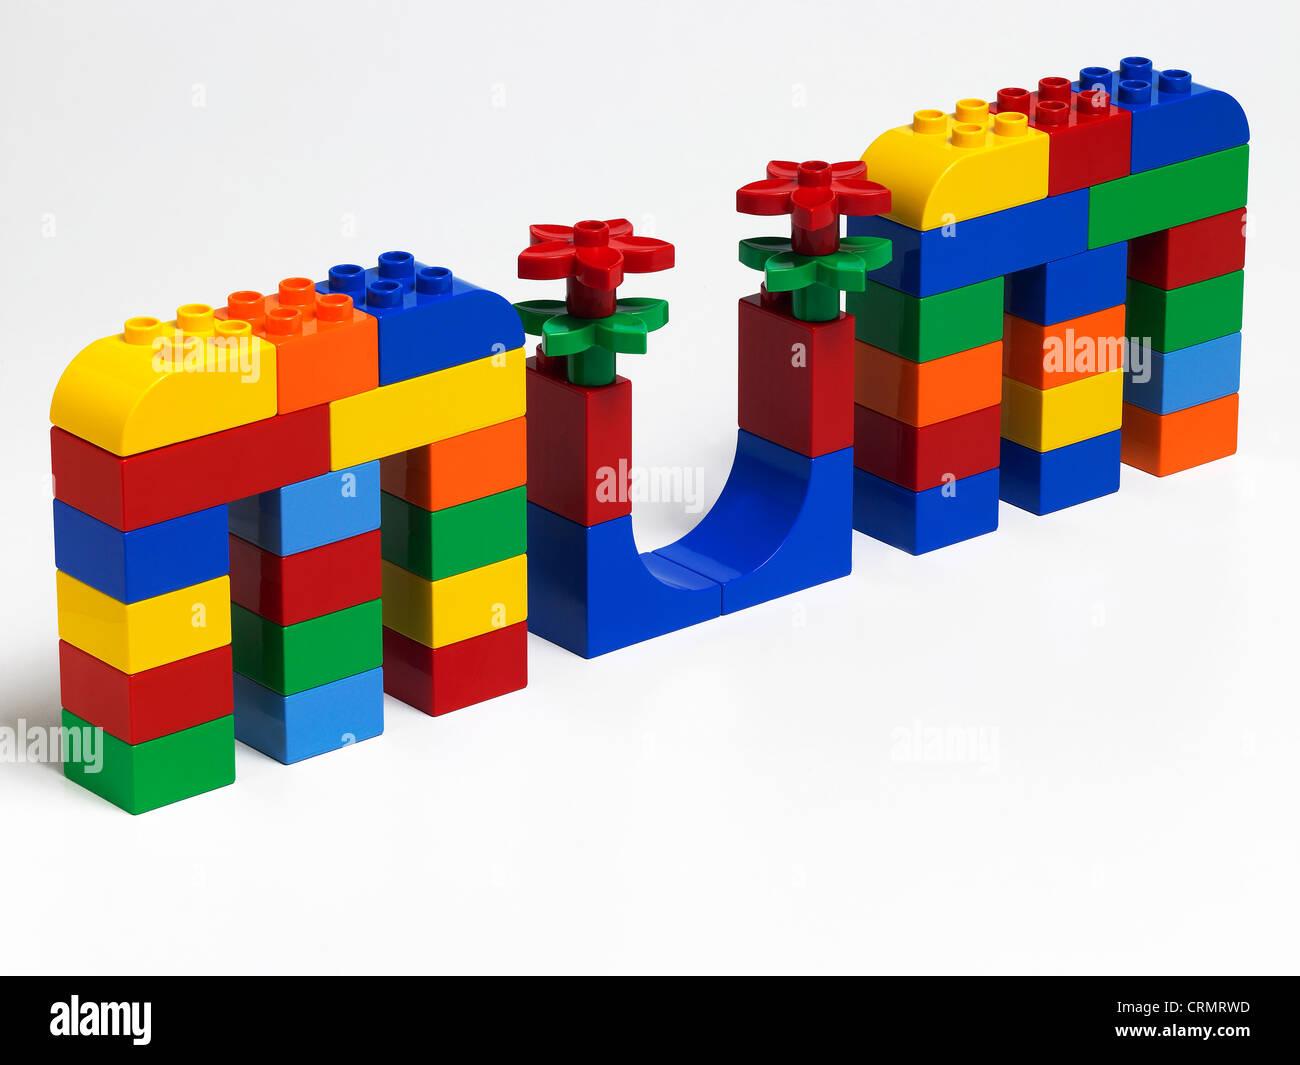 Coloured plastic building bricks spelling the word Mum - Stock Image